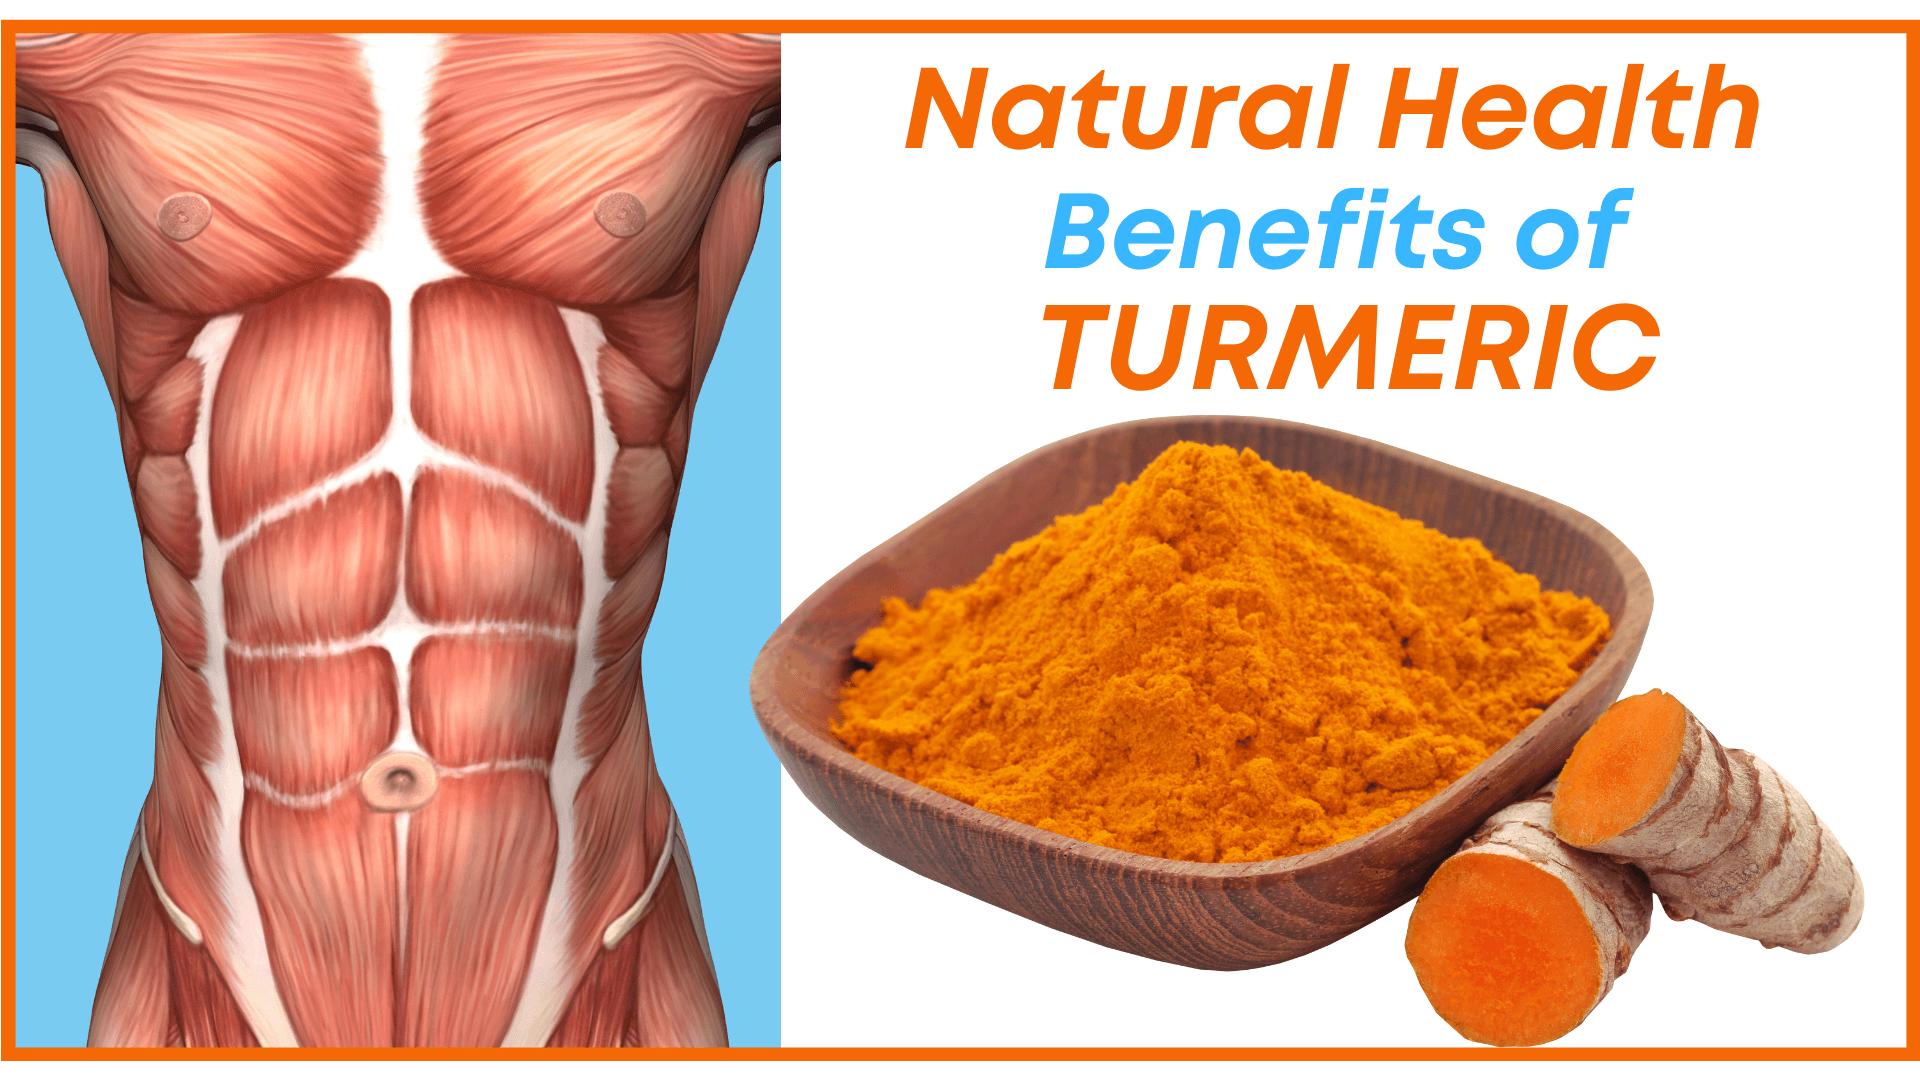 Natural Health Benefits of Turmeric